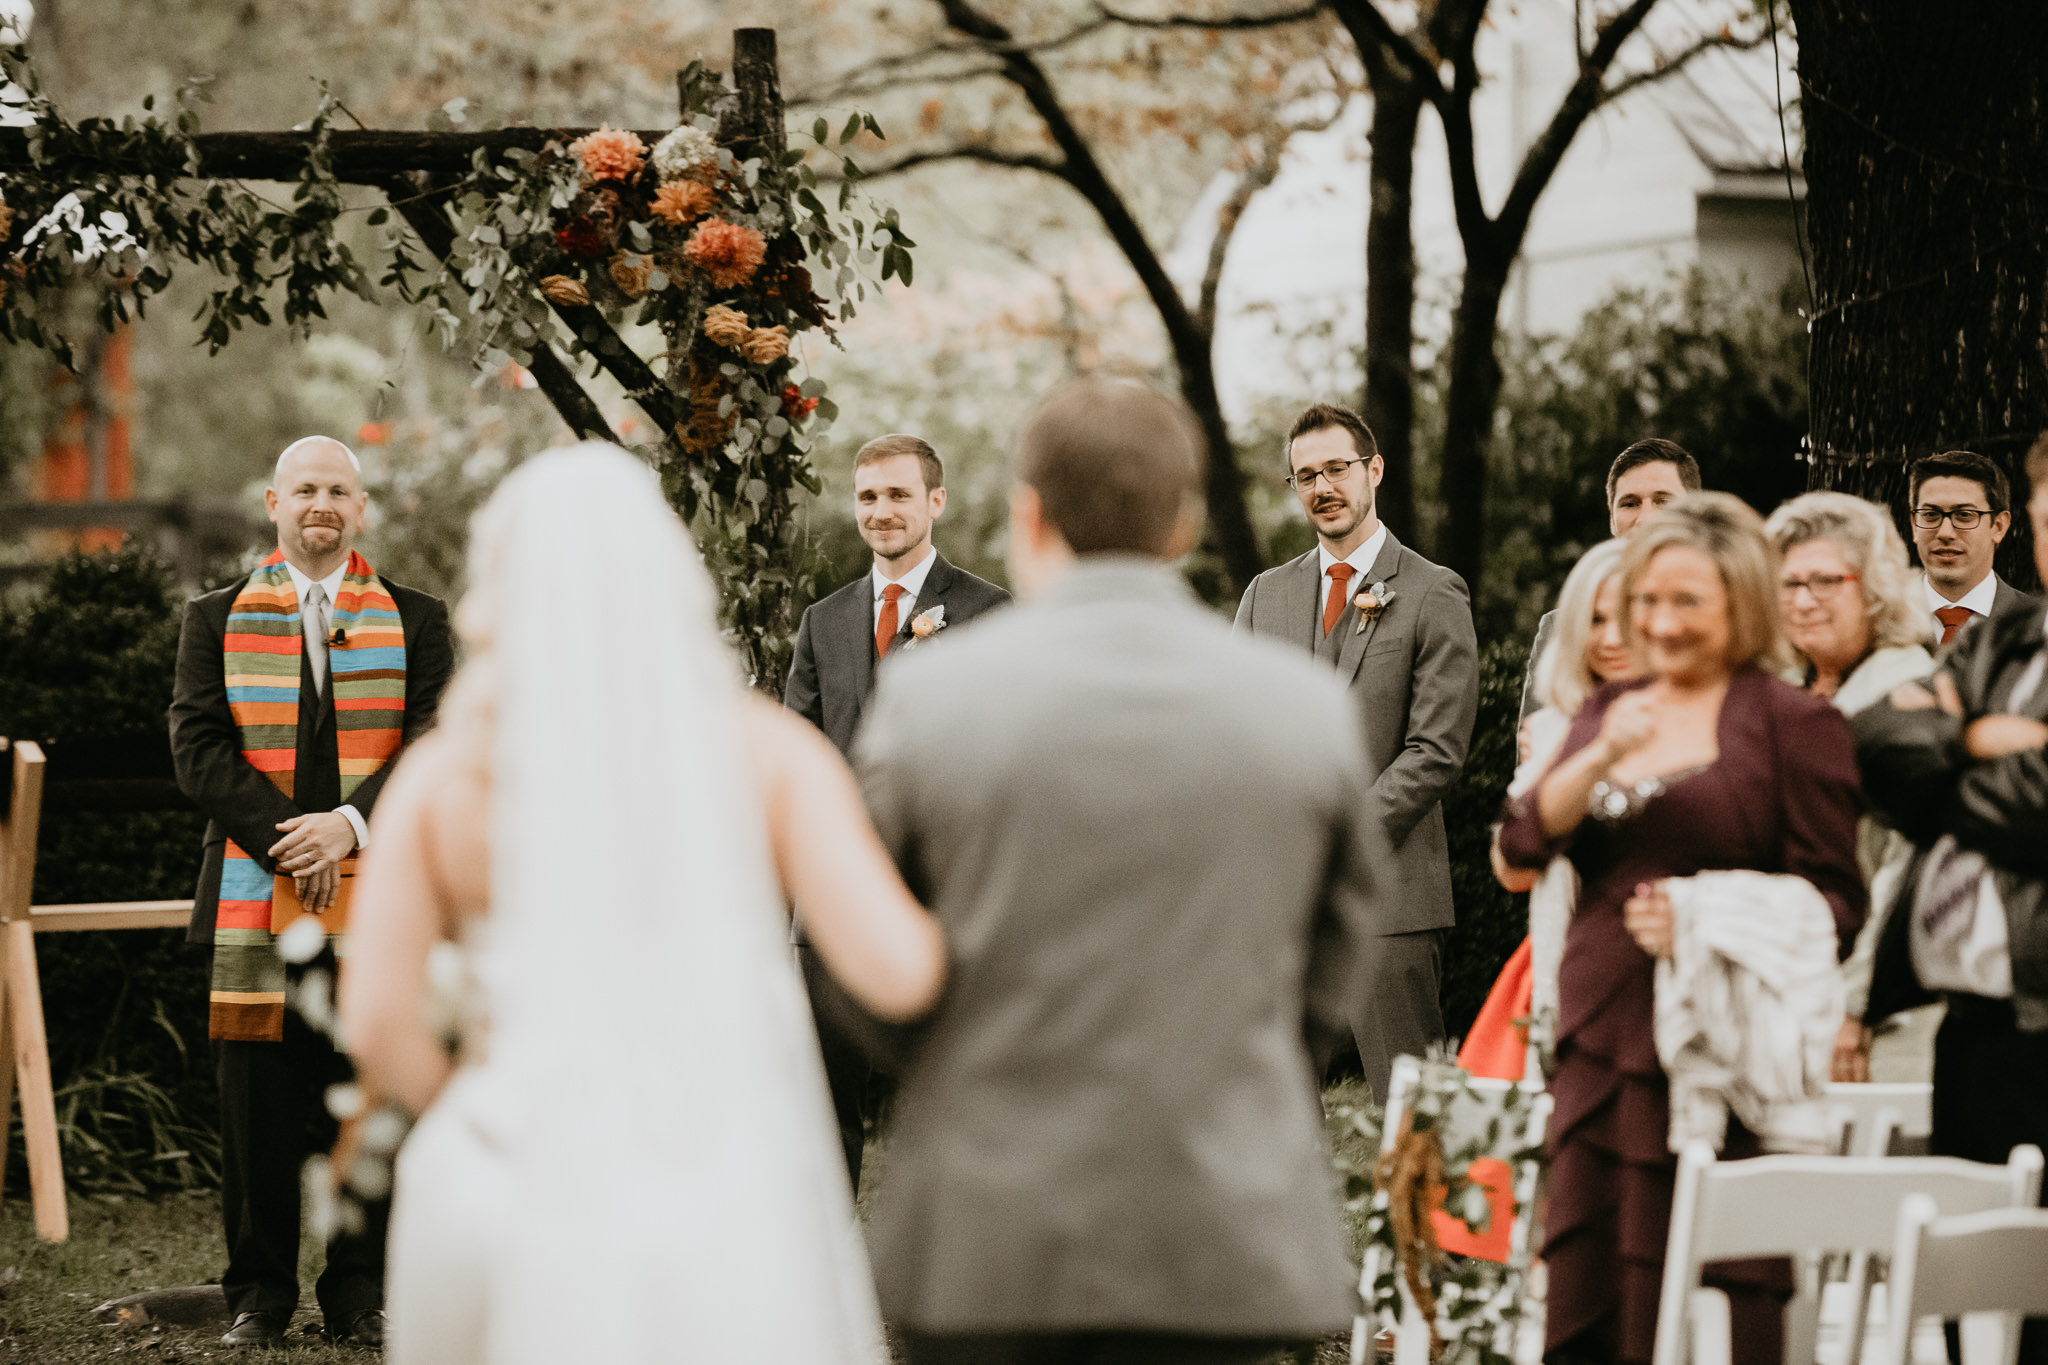 Sundara - Weddings - Virginia - Best Wedding Photographer - Pat Cori Photography-44.jpg